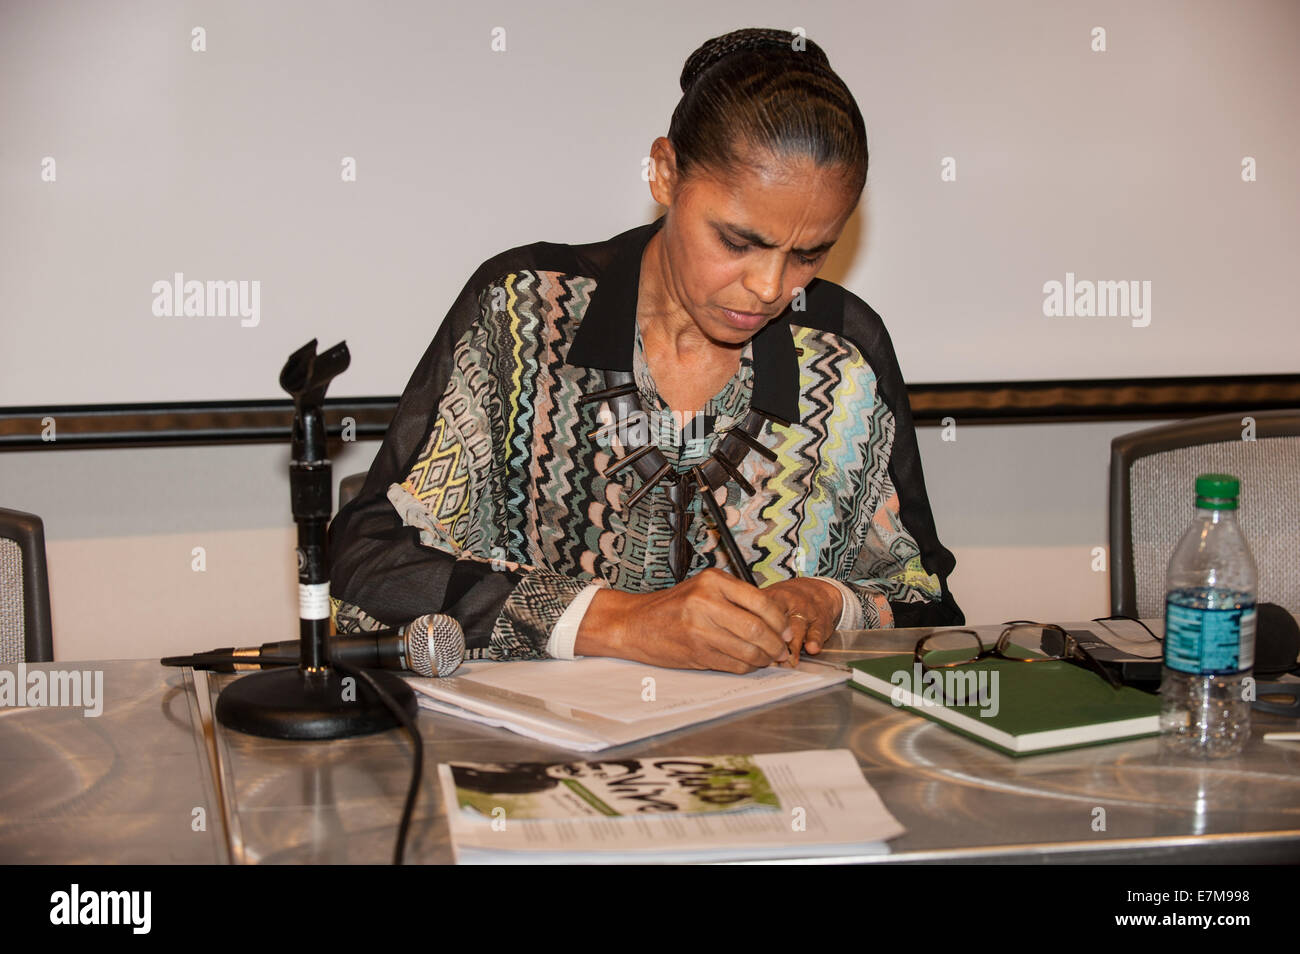 Washington DC, USA. Brazilian Presidential candidate Marina Silva, ex-Environment Minister and senator, keynote - Stock Image